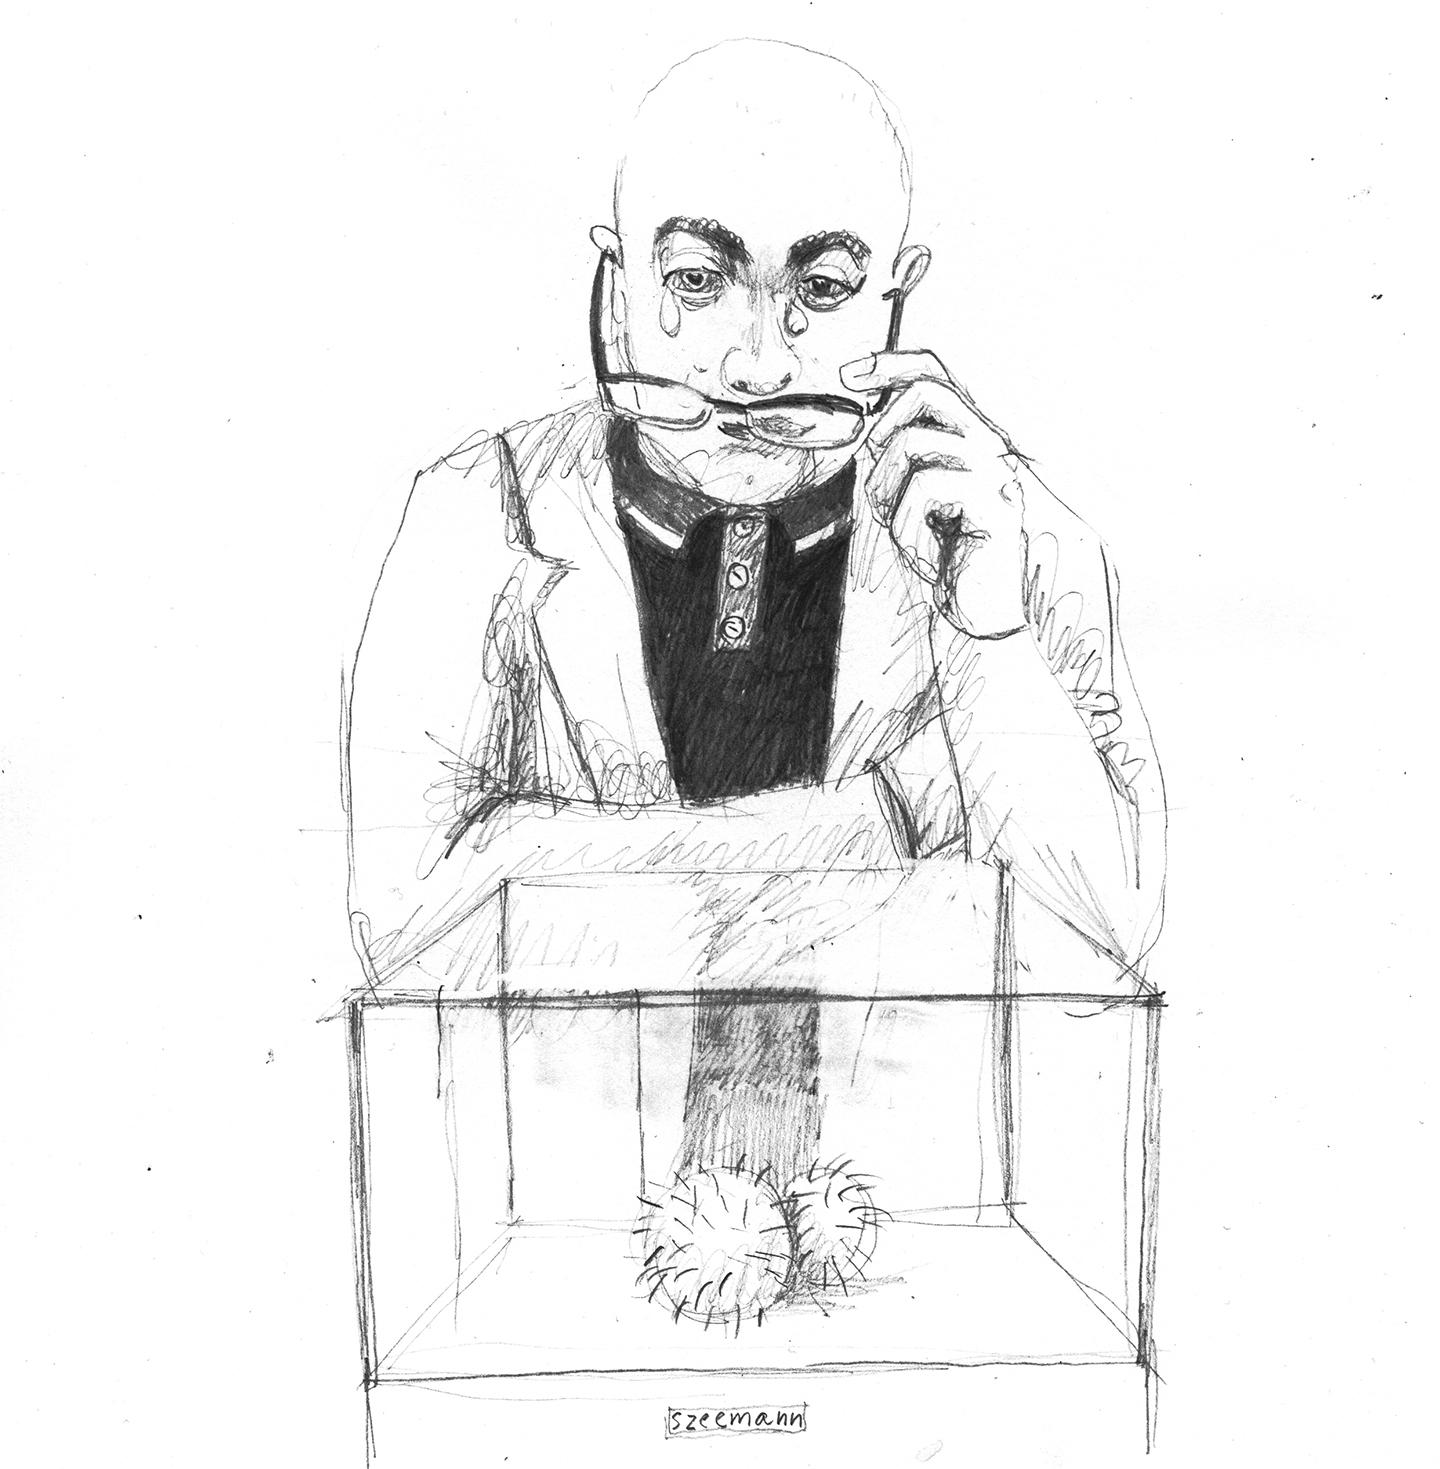 Illustration by Juan Perez Agirregoikoa